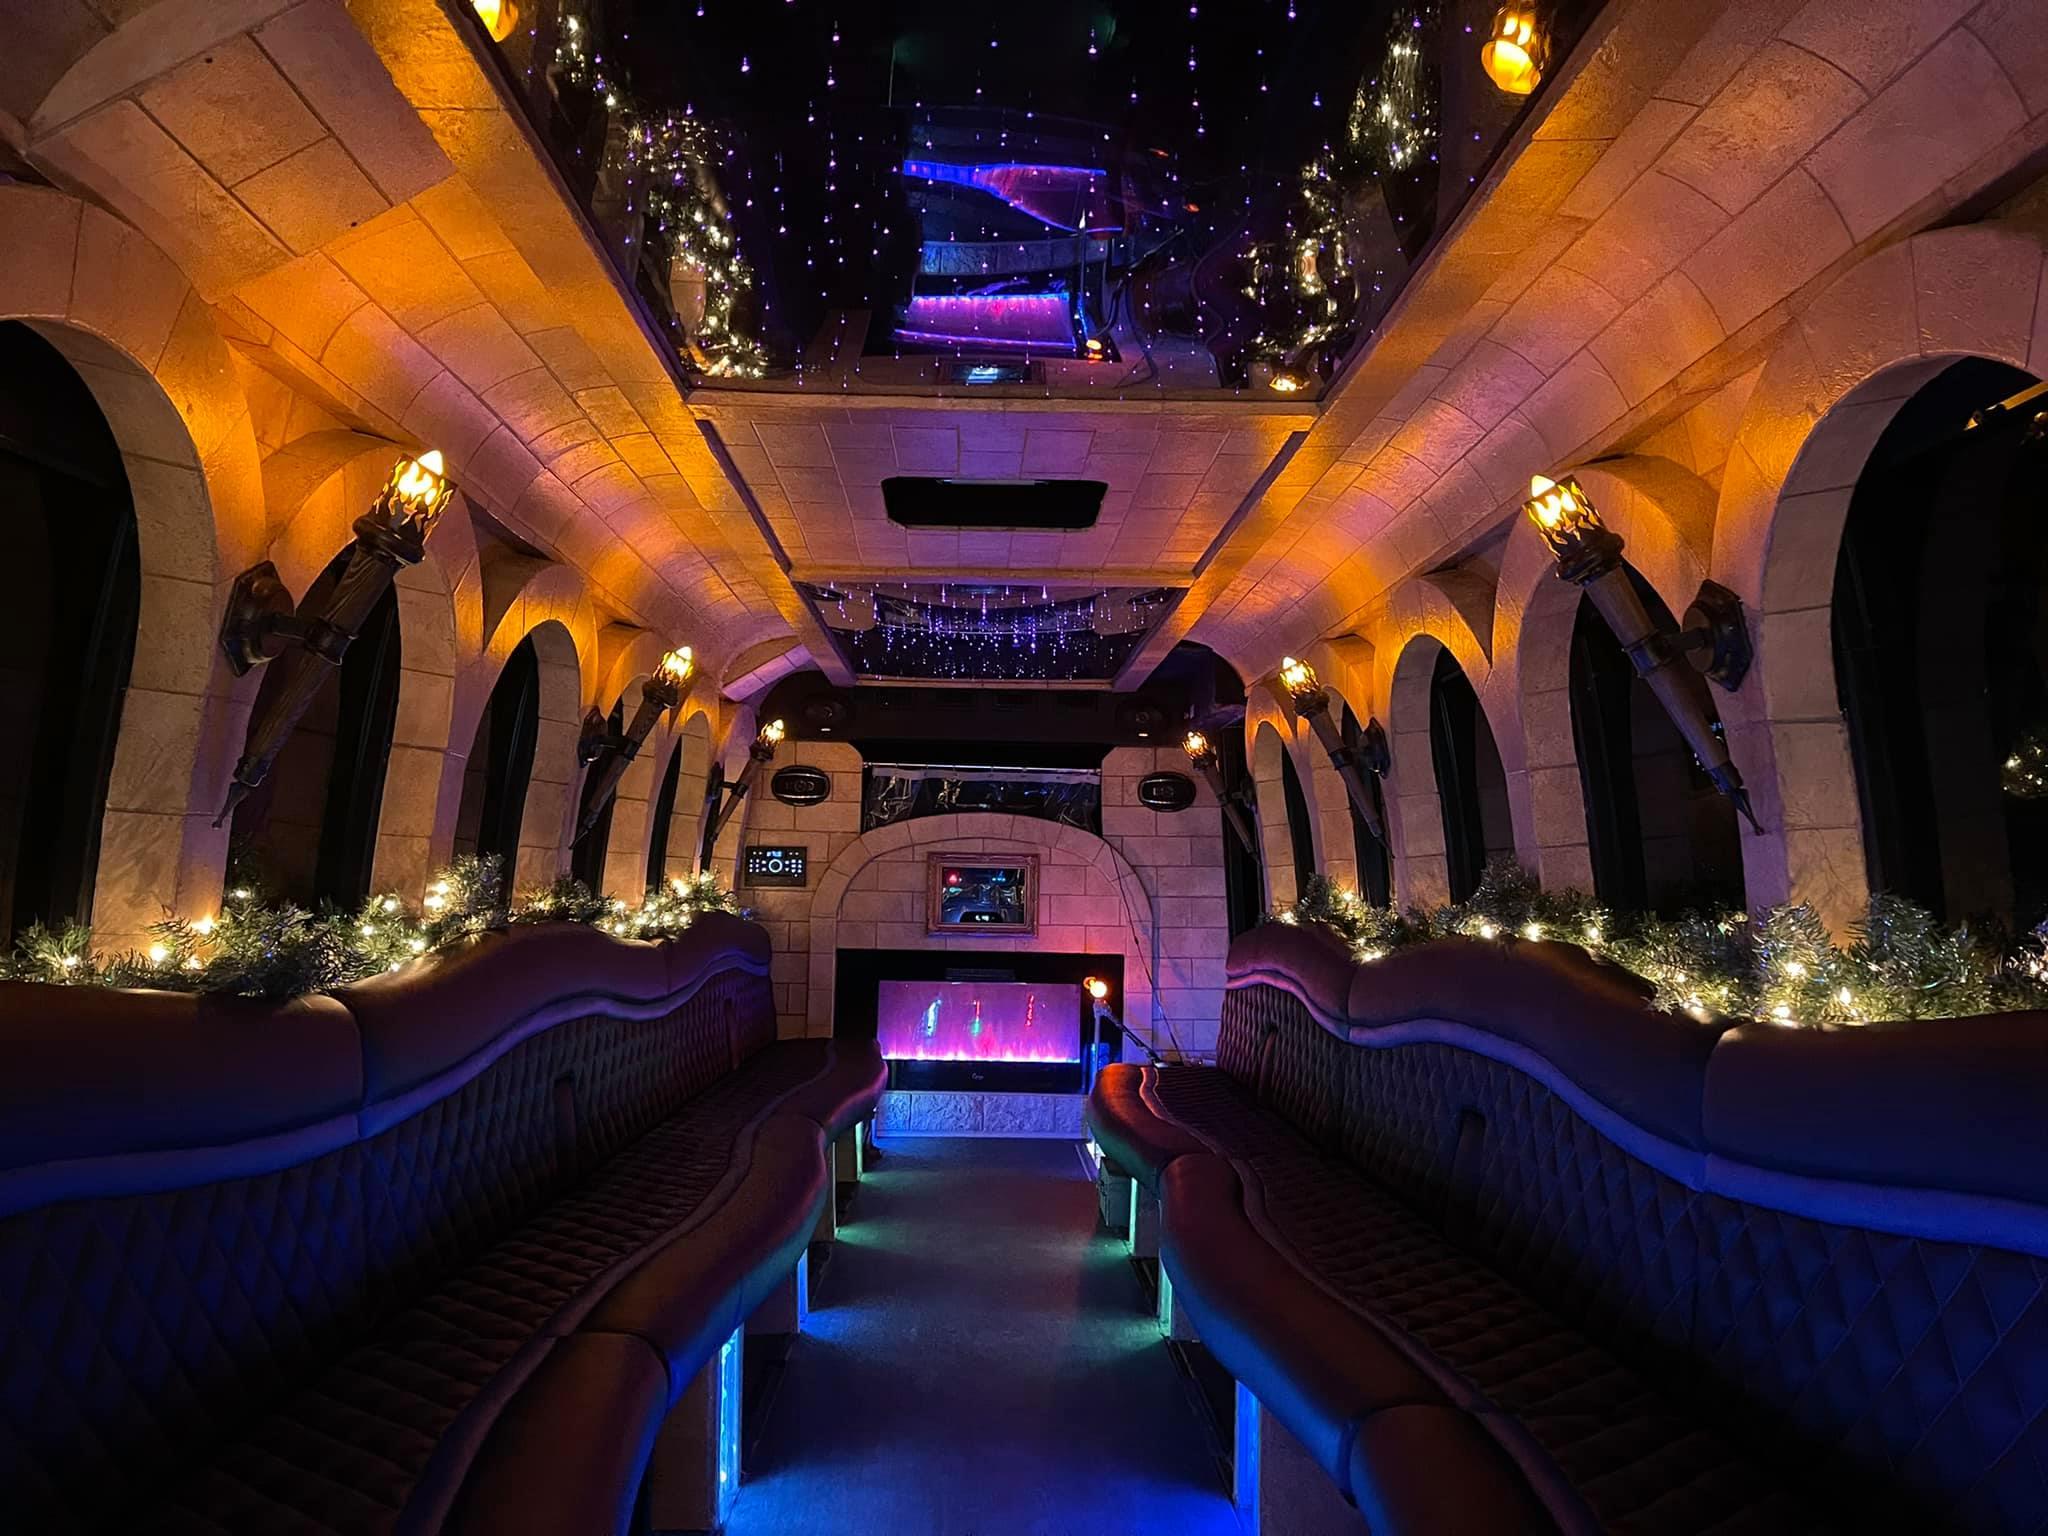 Castle Dreamliner Party Bus Fireplace